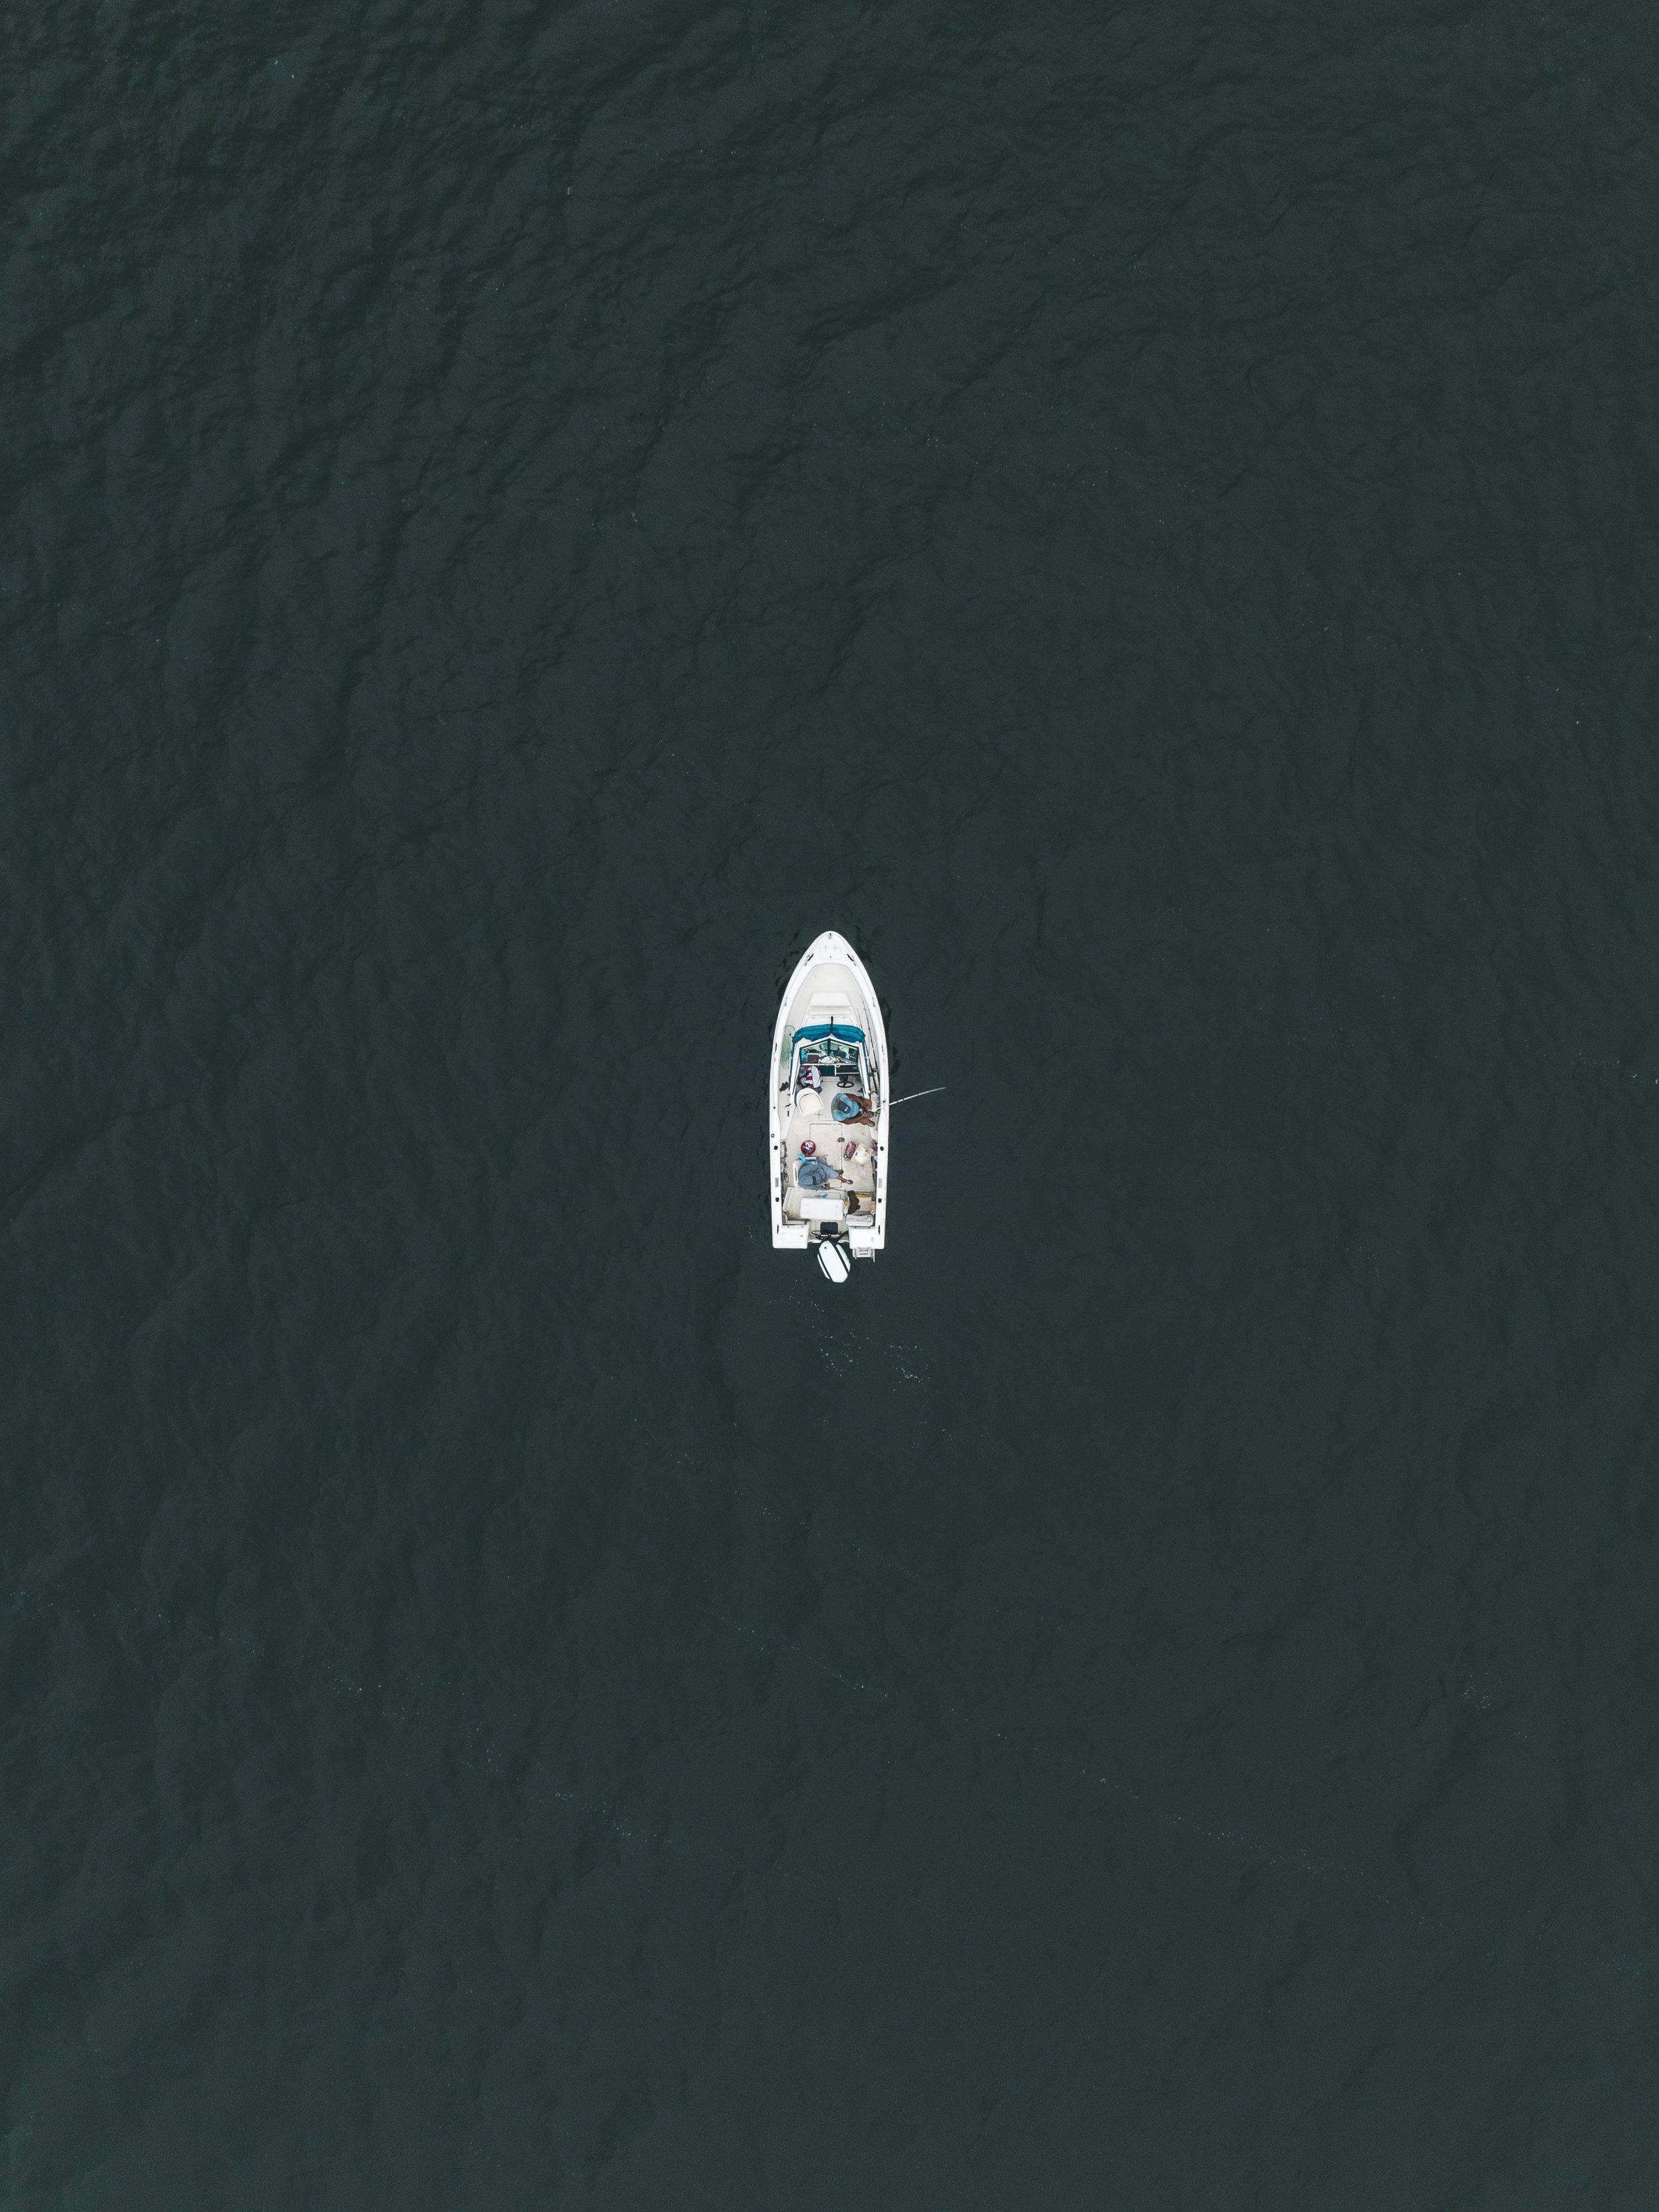 OceanCity,NJ-3.jpg